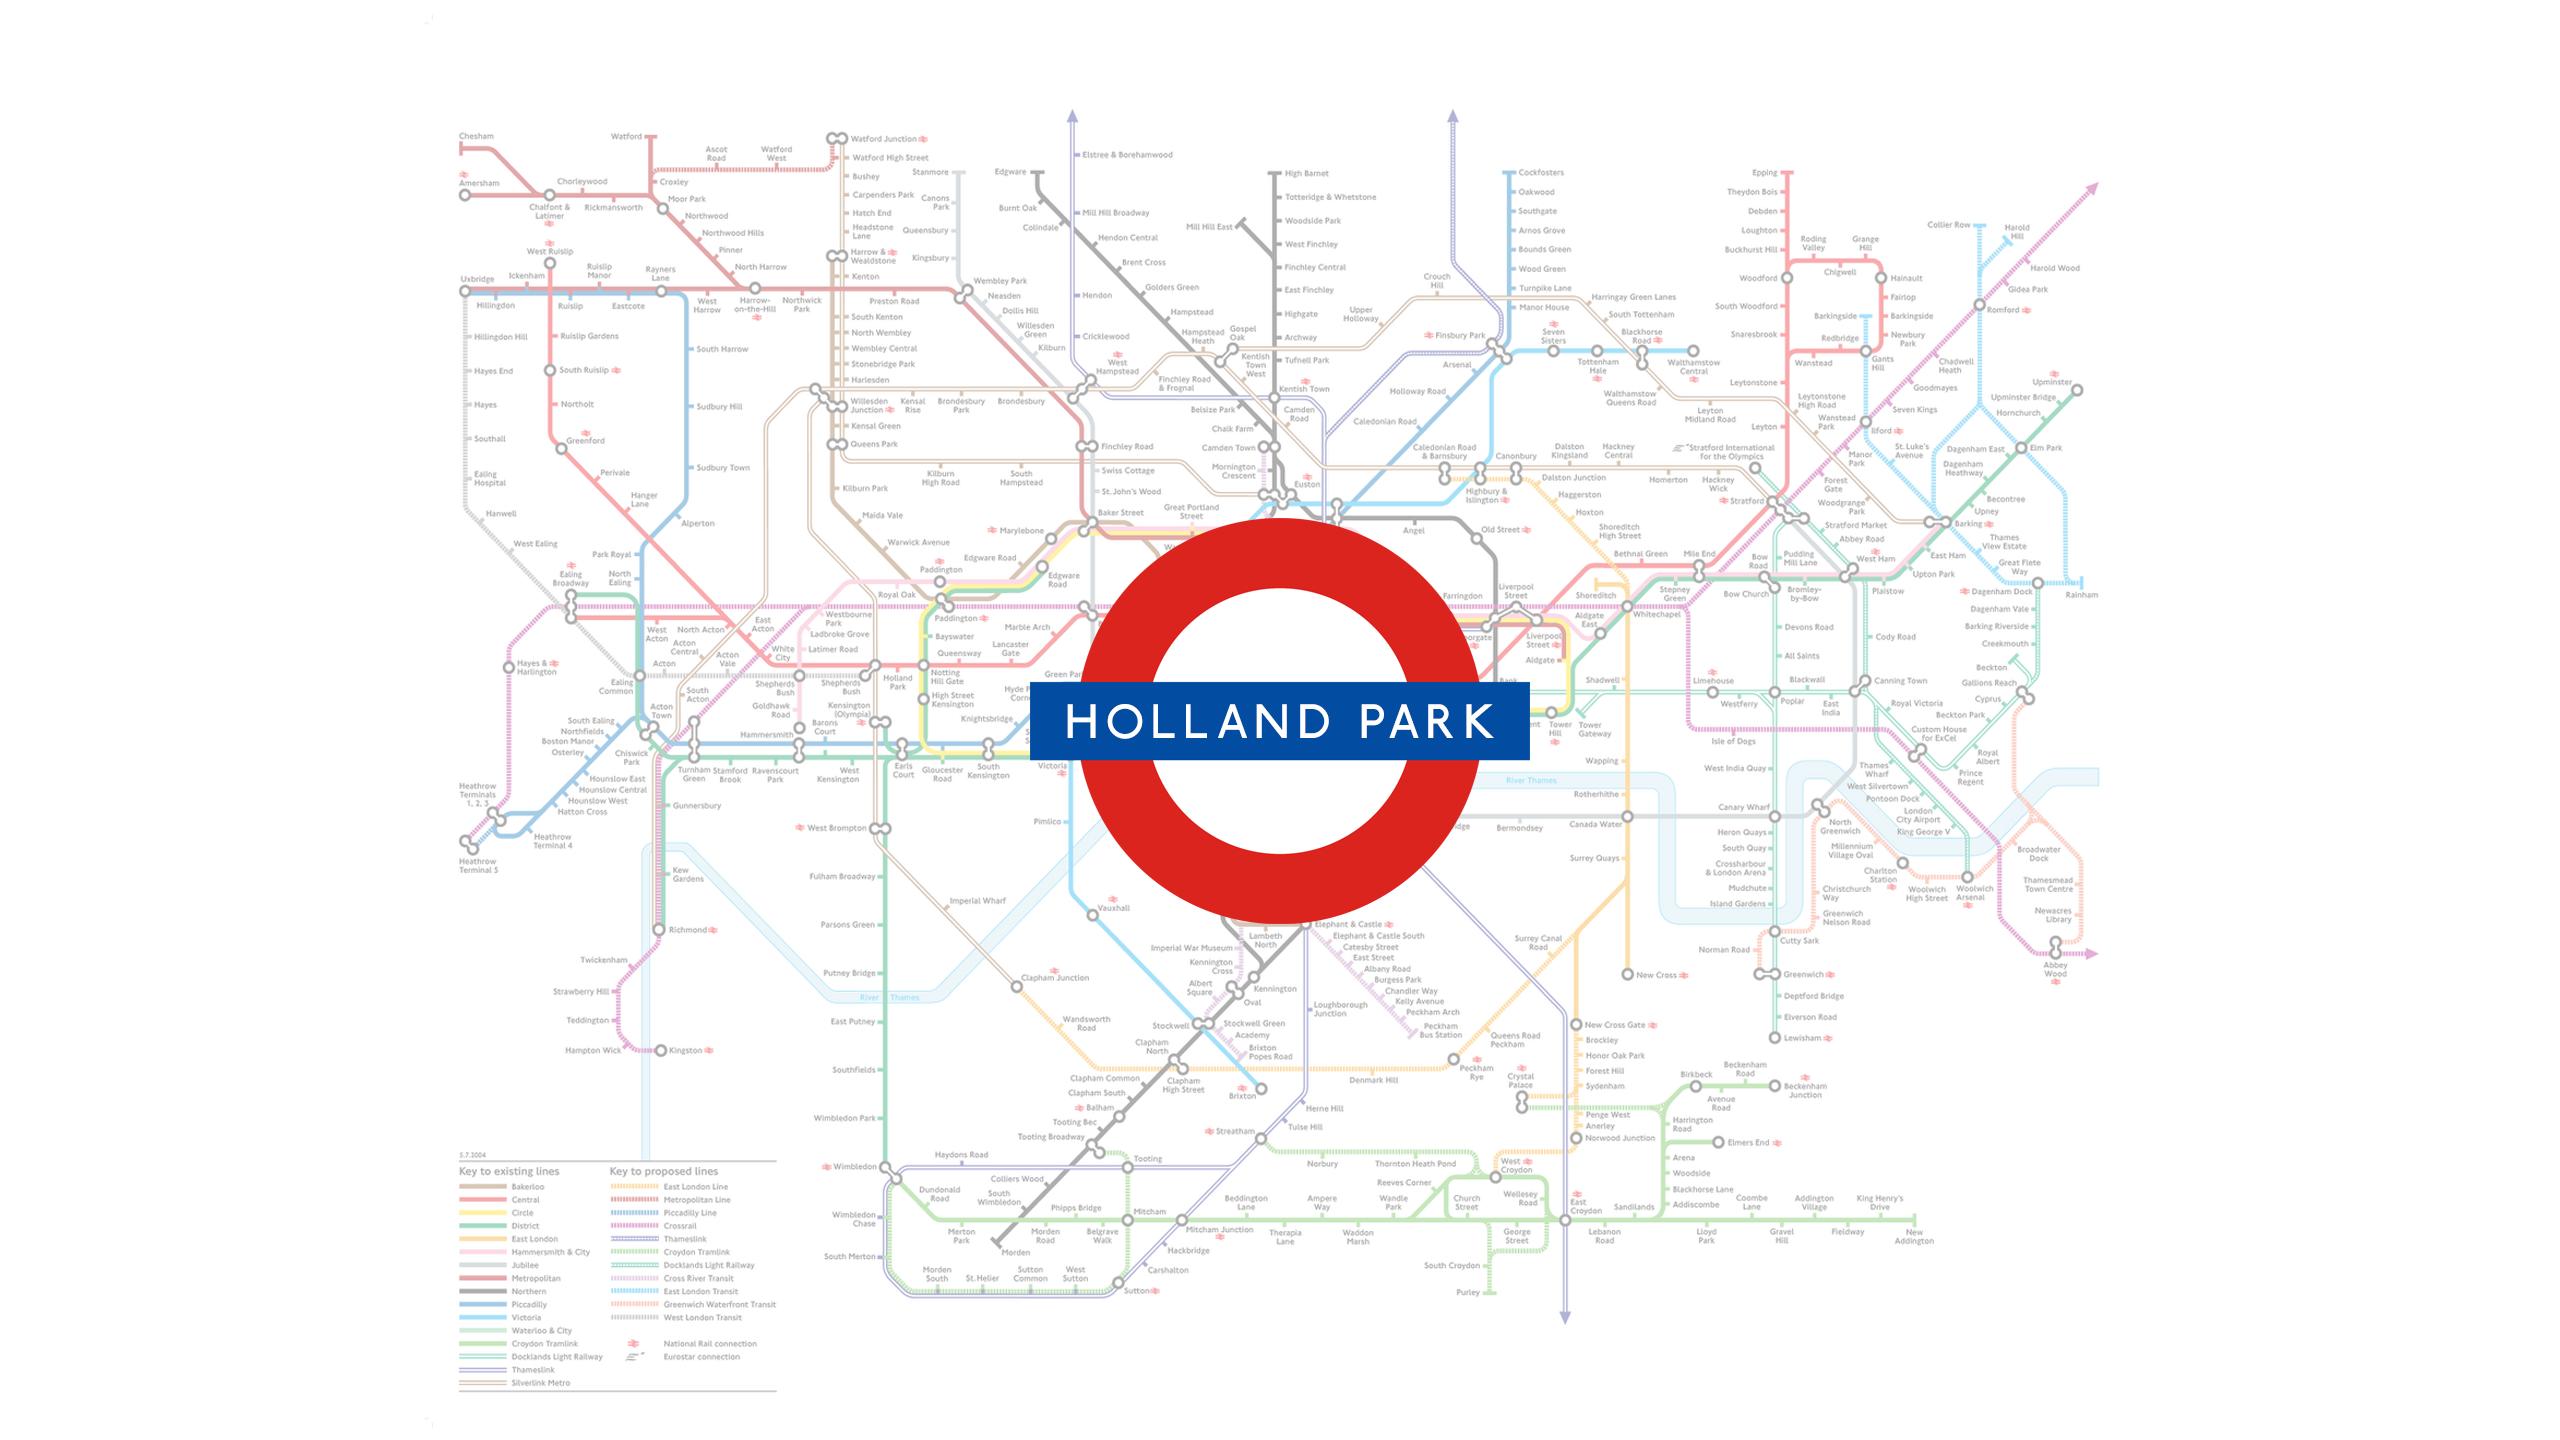 Holland Park (Map)